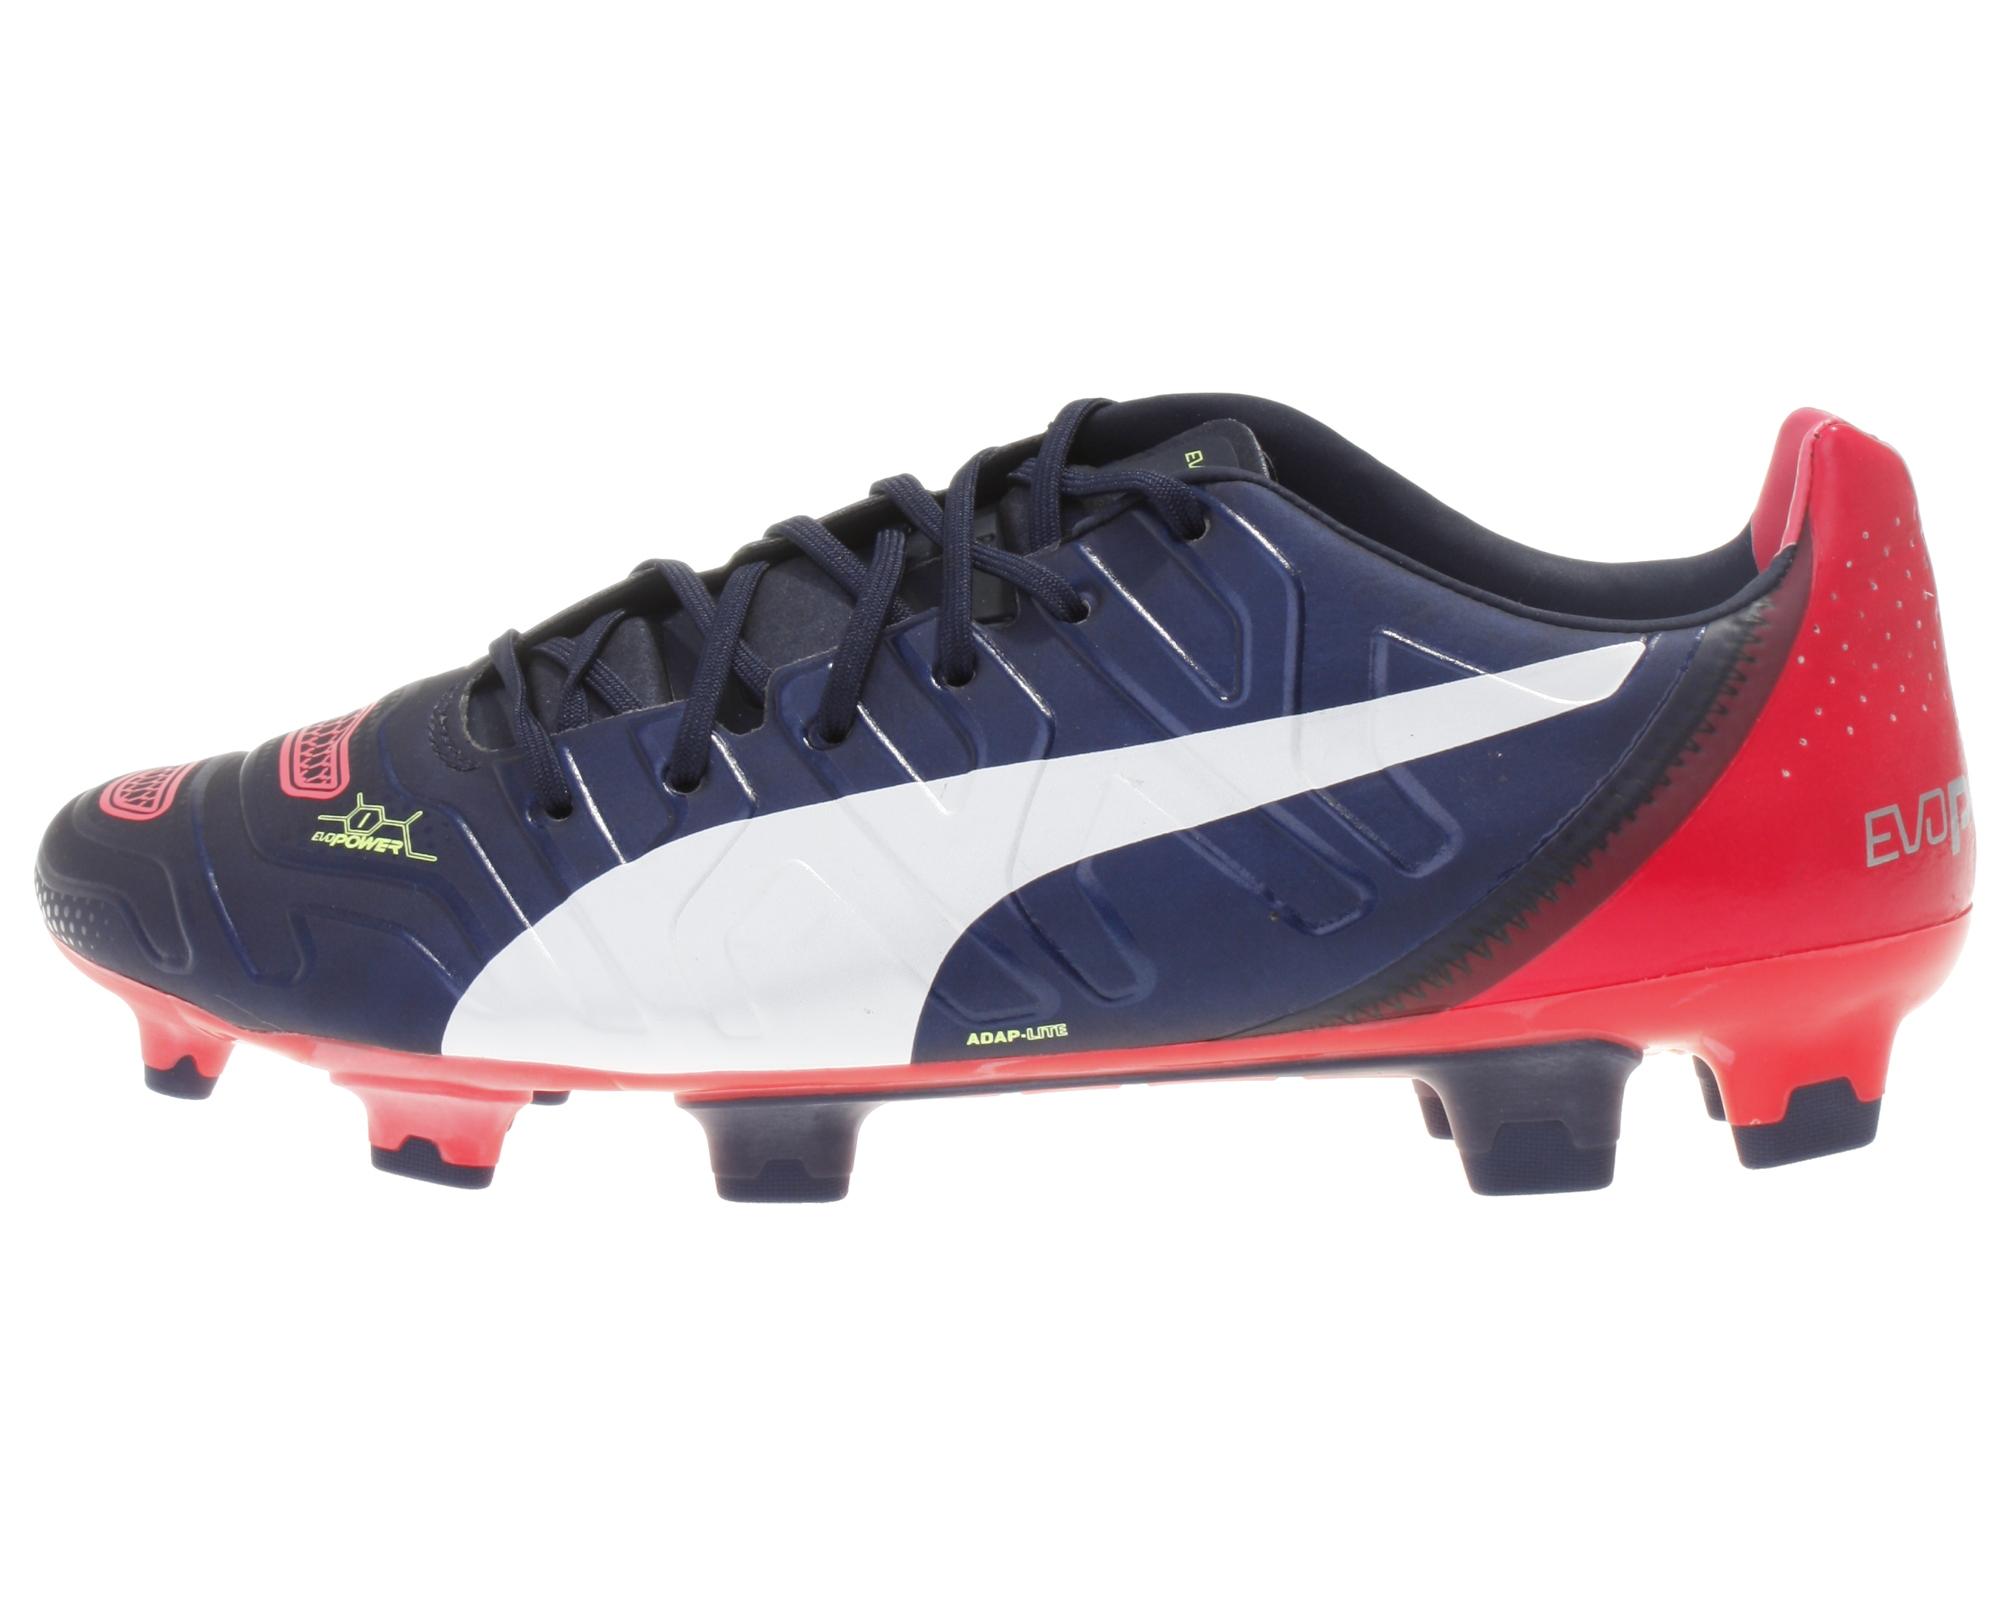 Fg 103171 01 Fußball Evopower Schuhe 1 Herren Puma 2 6Yg7bfy